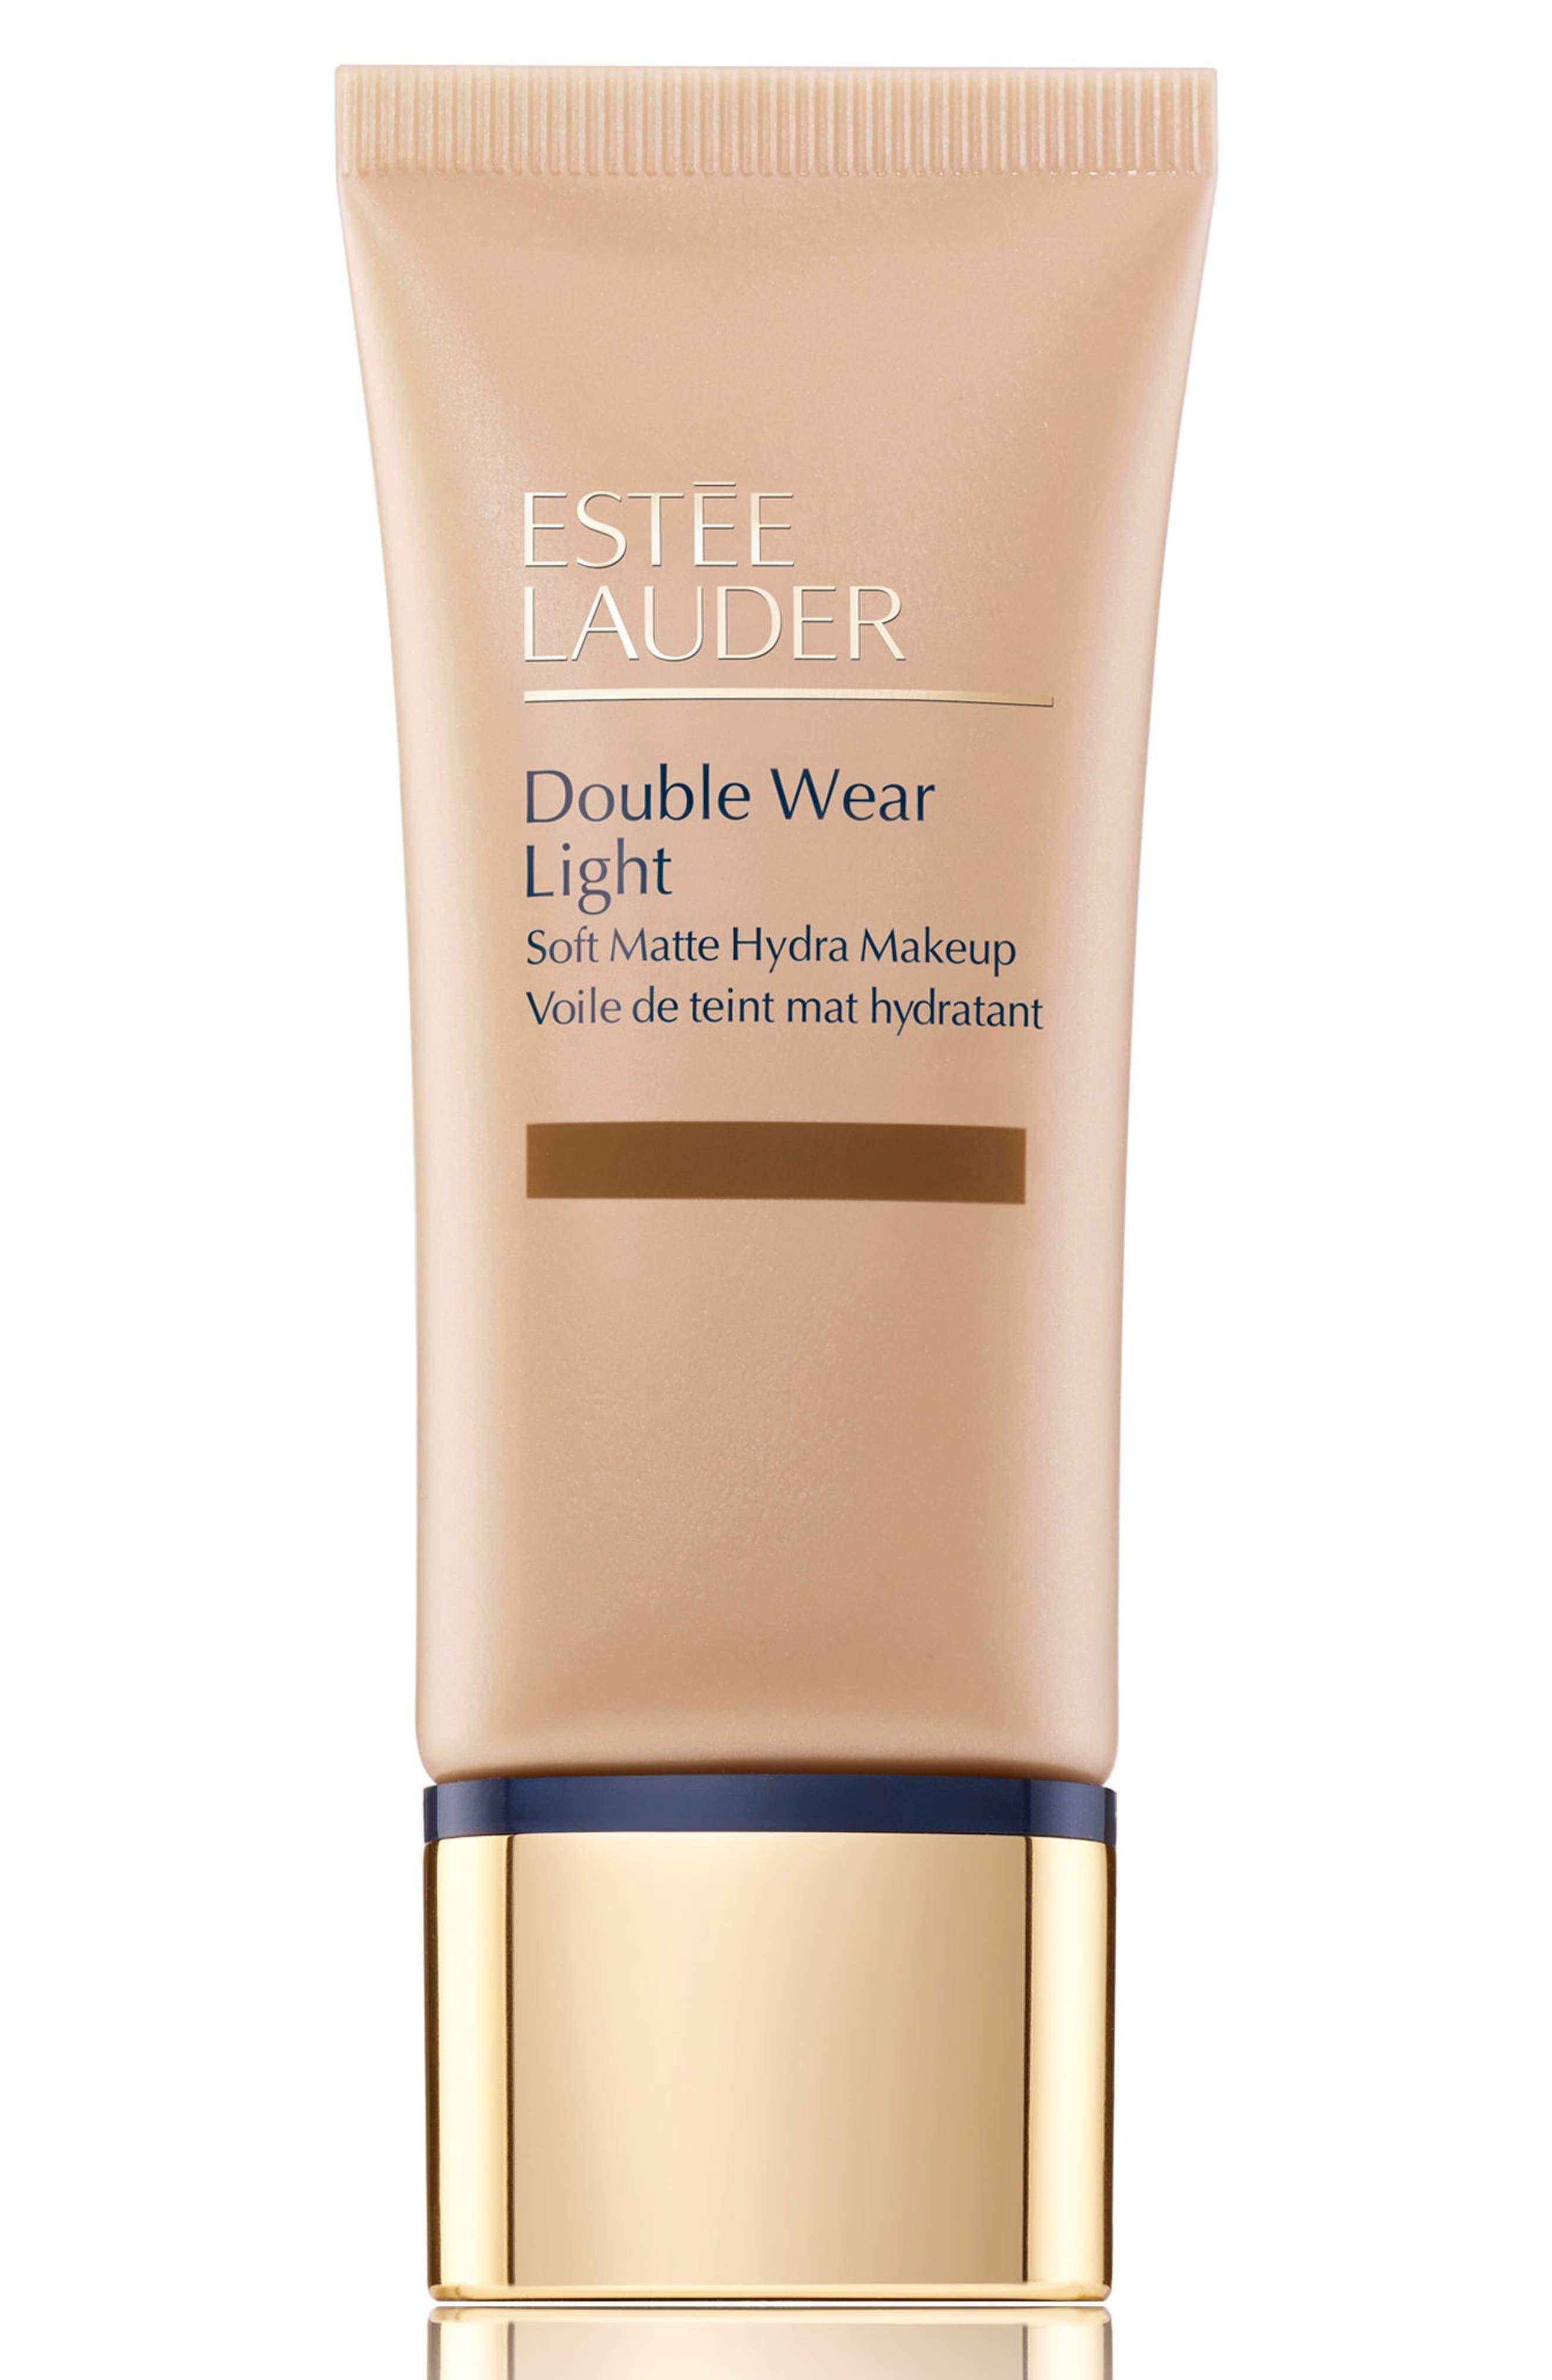 Estee Lauder Double Wear Light Soft Matte Hydra Makeup - 6N2 Truffle